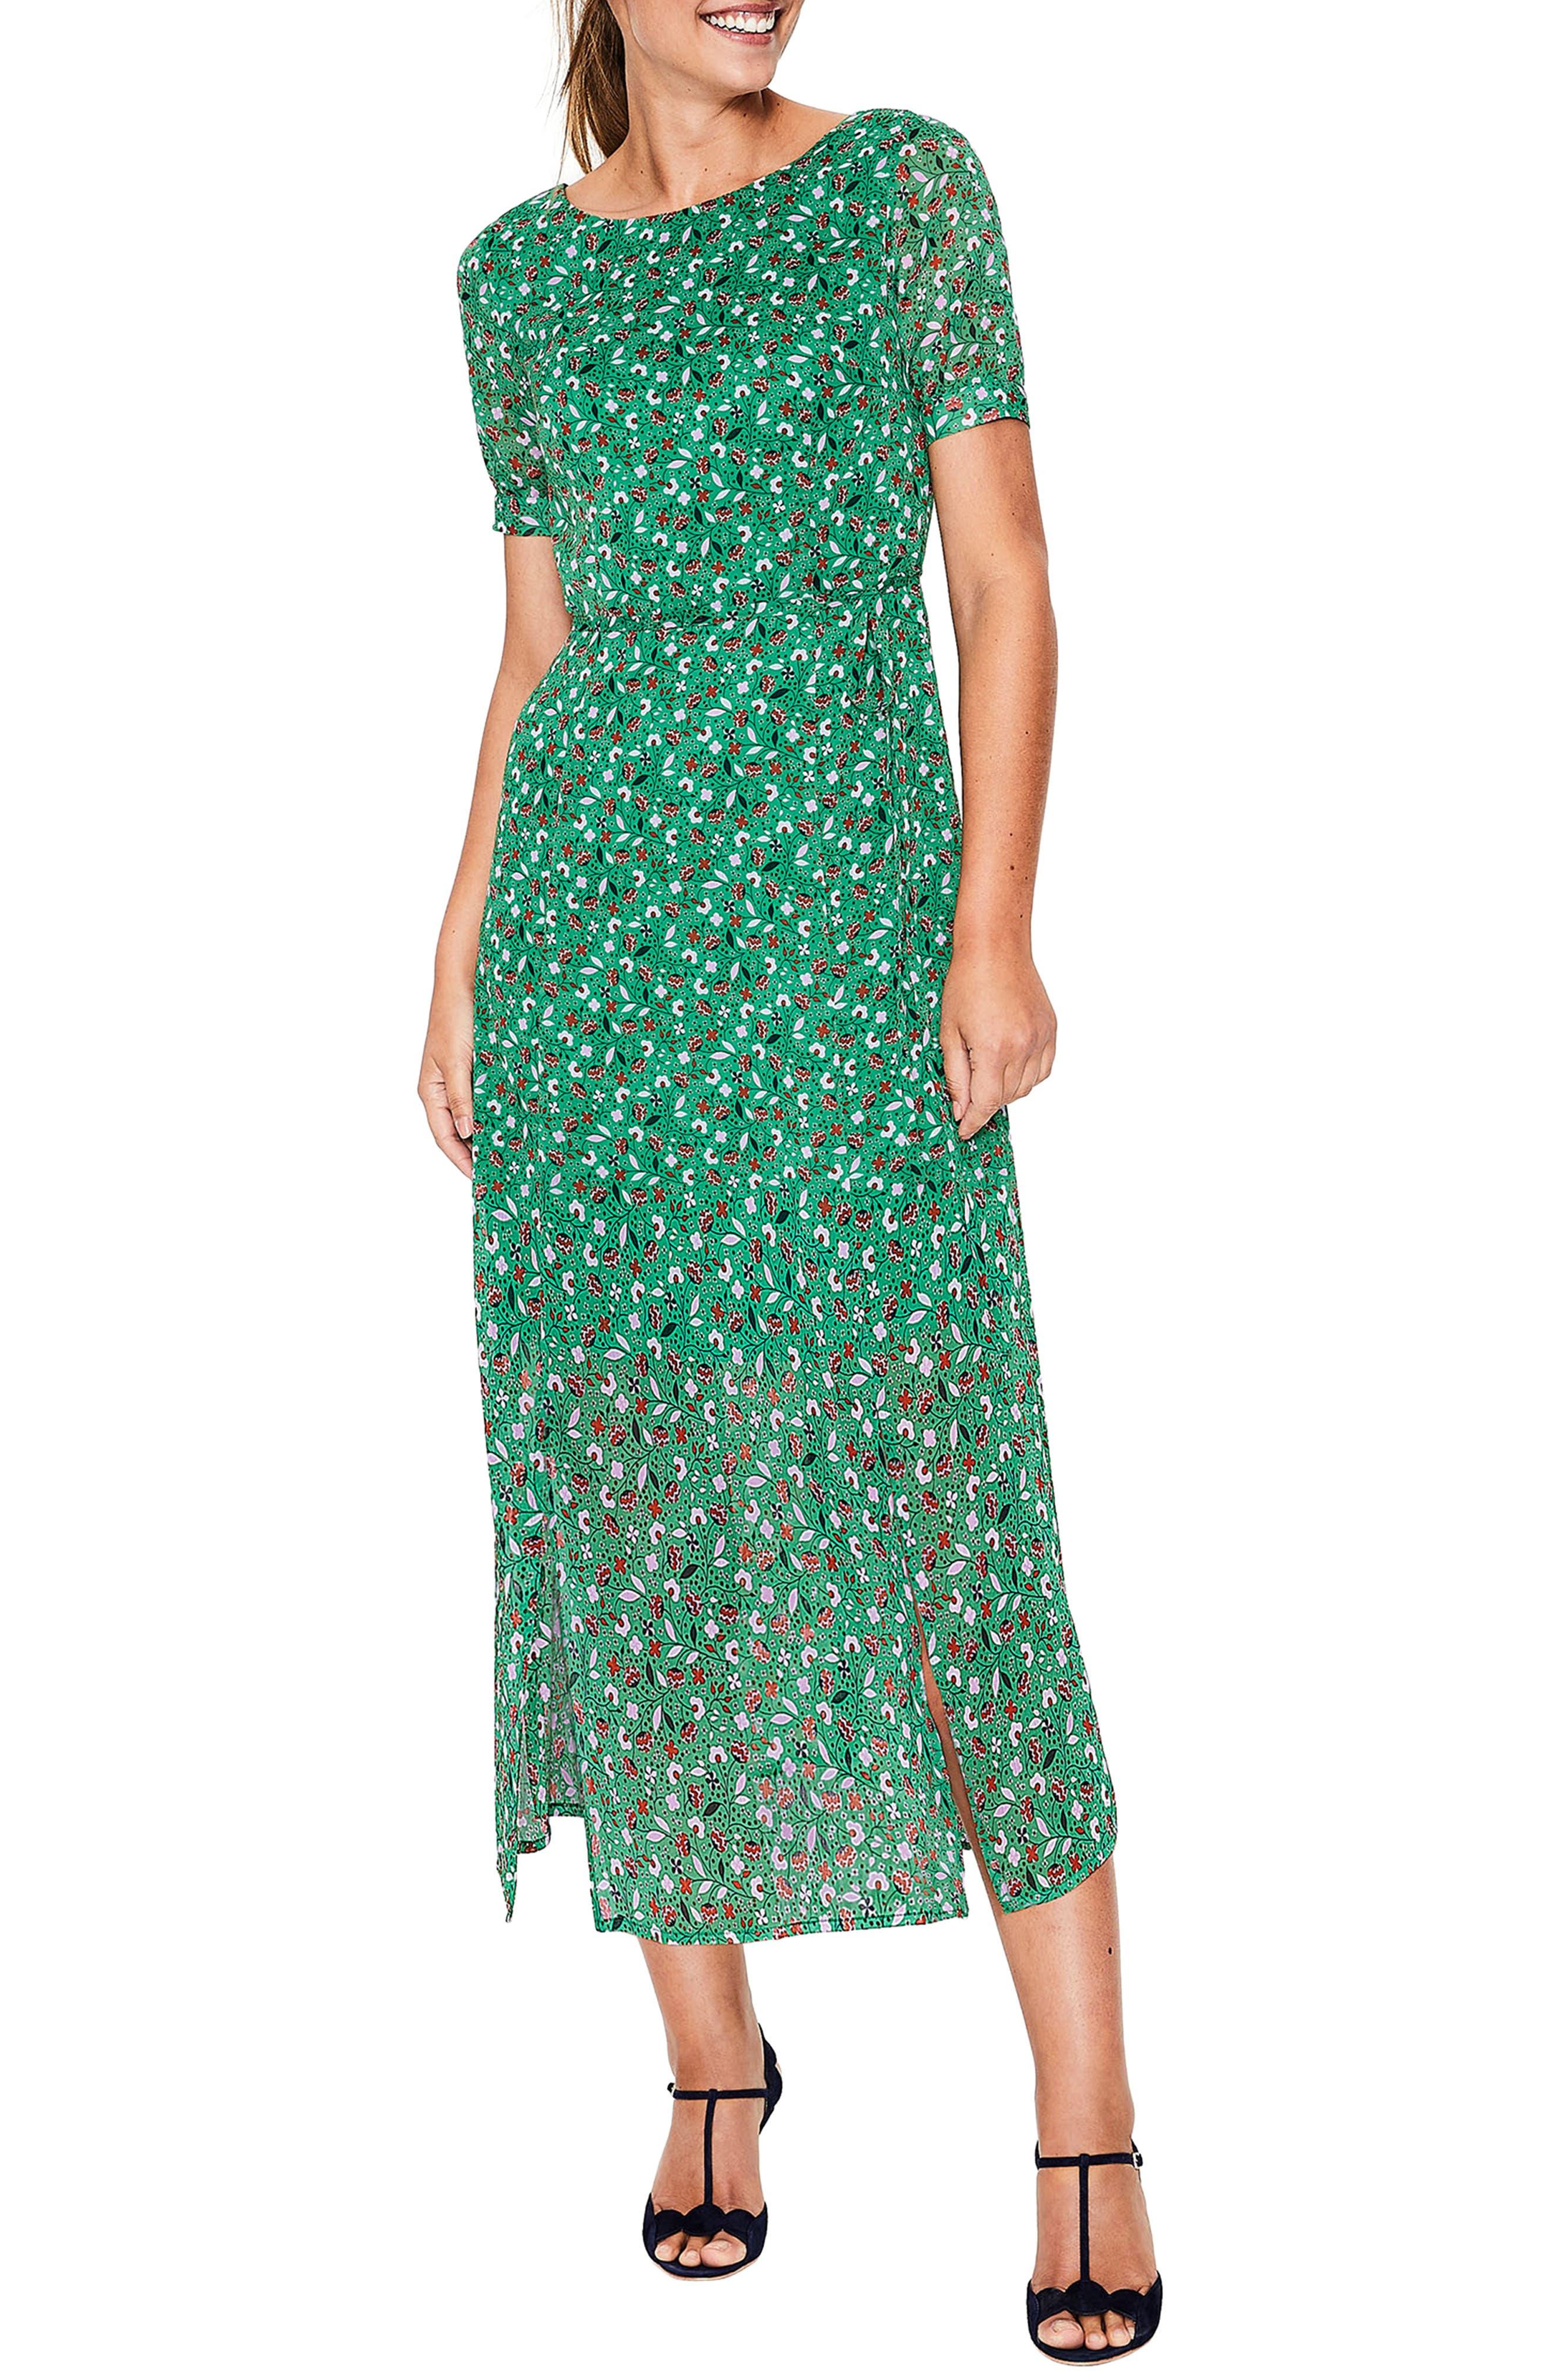 Petite Boden Jane Midi Dress, Green